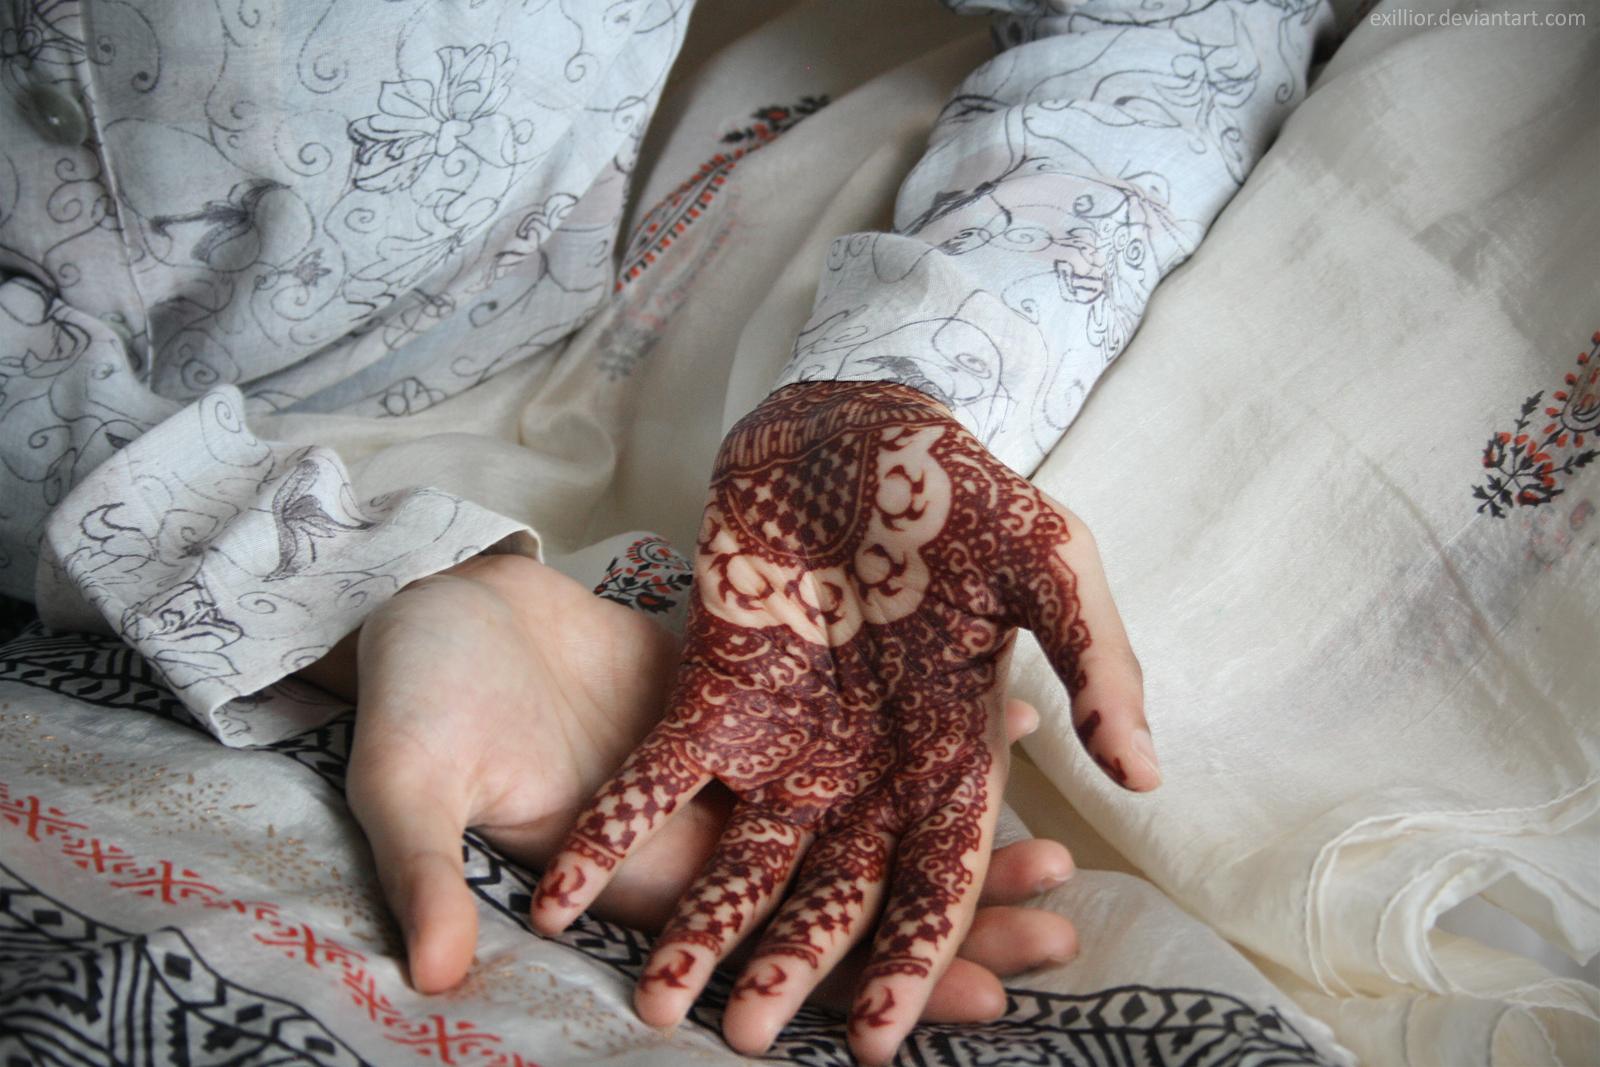 Henna 19 by Exillior